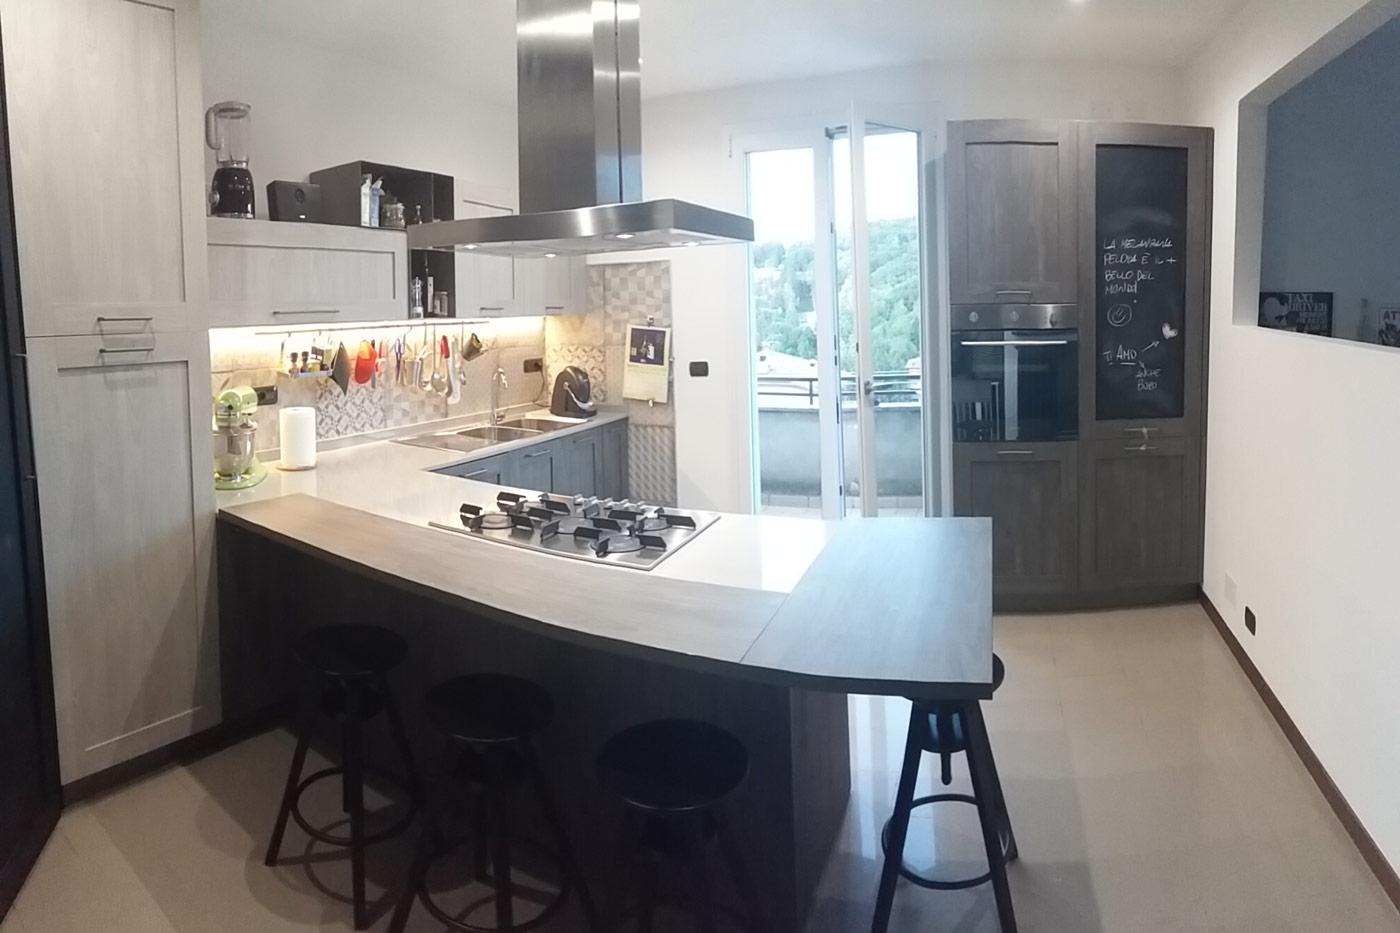 Cucina valerio frignano design for Cucine piano cottura centrale